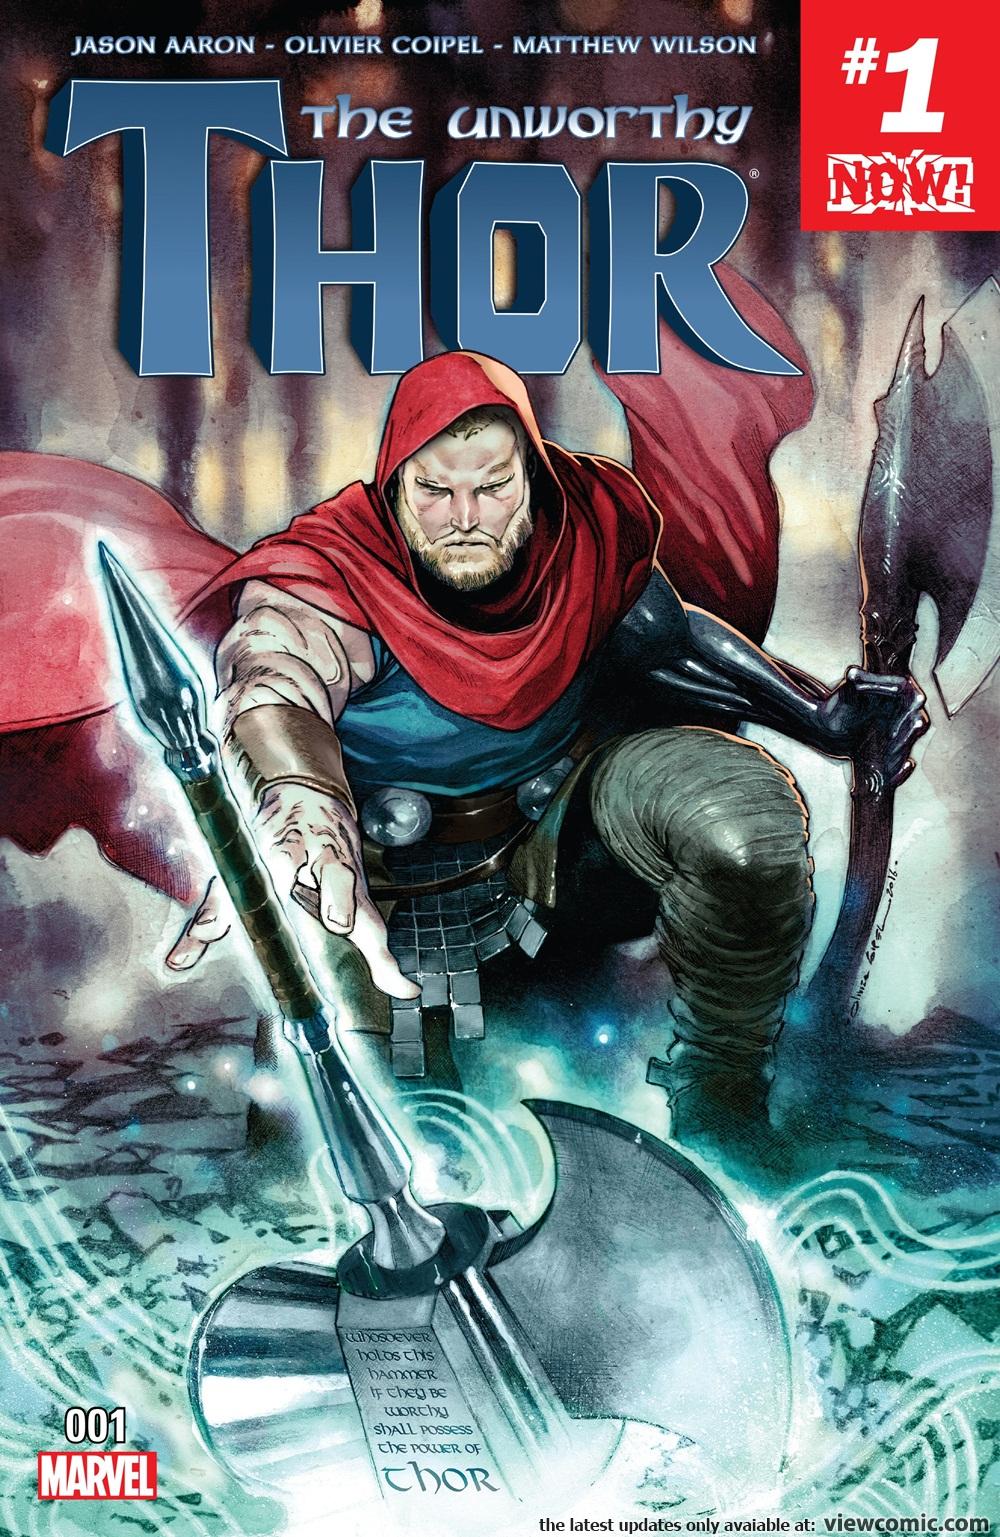 O Indigno Thor #1